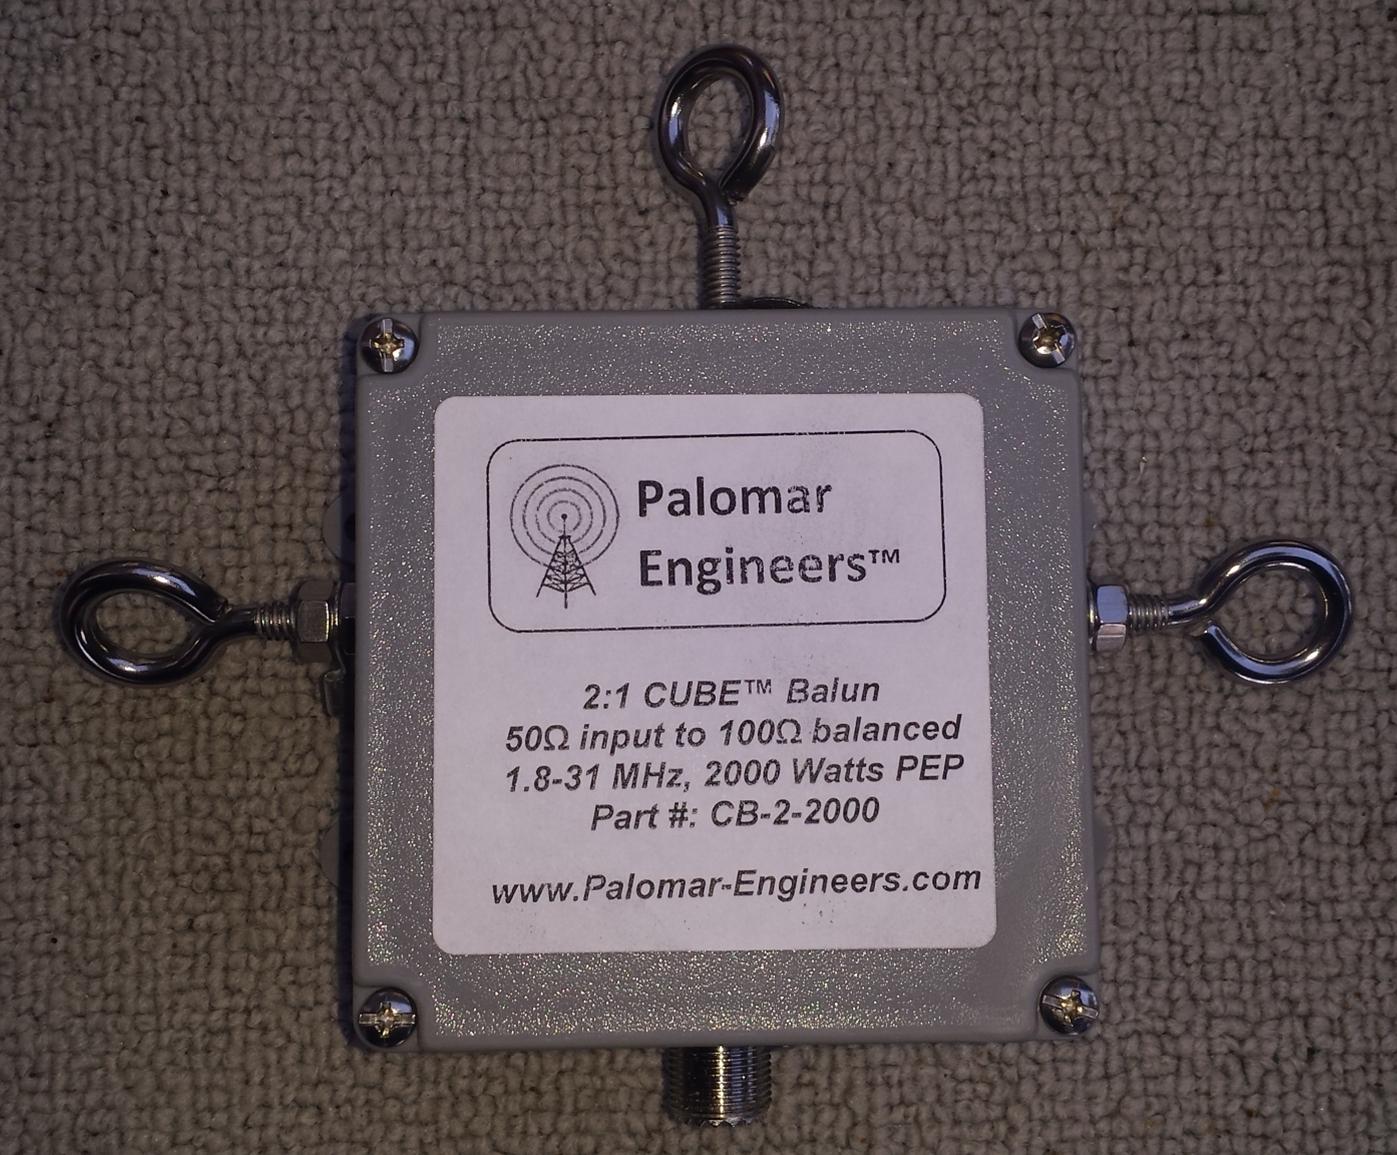 50:100 (2:1) CUBE™ Quad Core Balun, 1.8-60 MHz, 2KW, Loop Antennas - Eyebolts CB-2-2000EBX